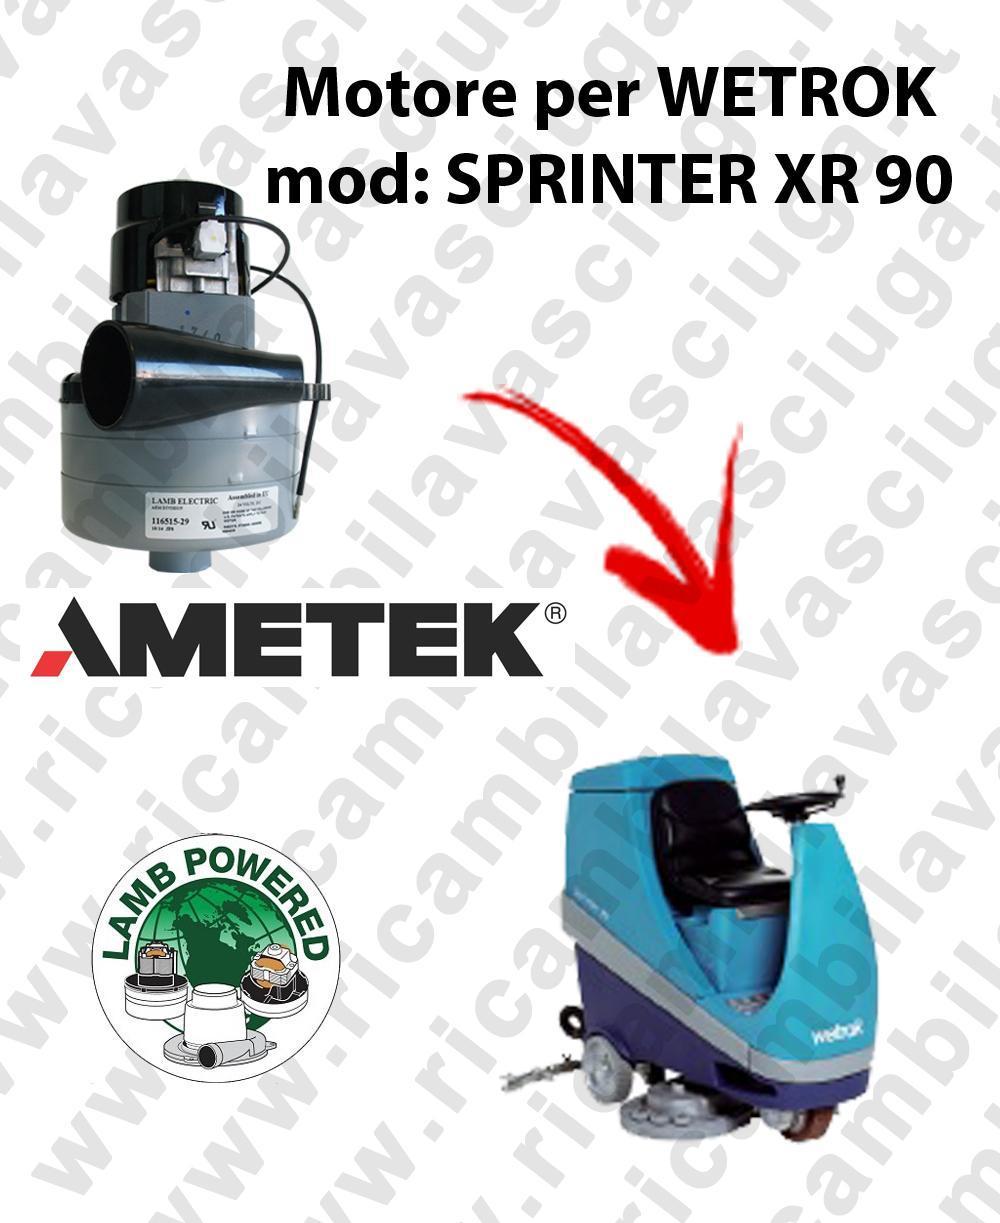 SPRINTER XR 90 Saugmotor LAMB AMETEK für scheuersaugmaschinen WETROK